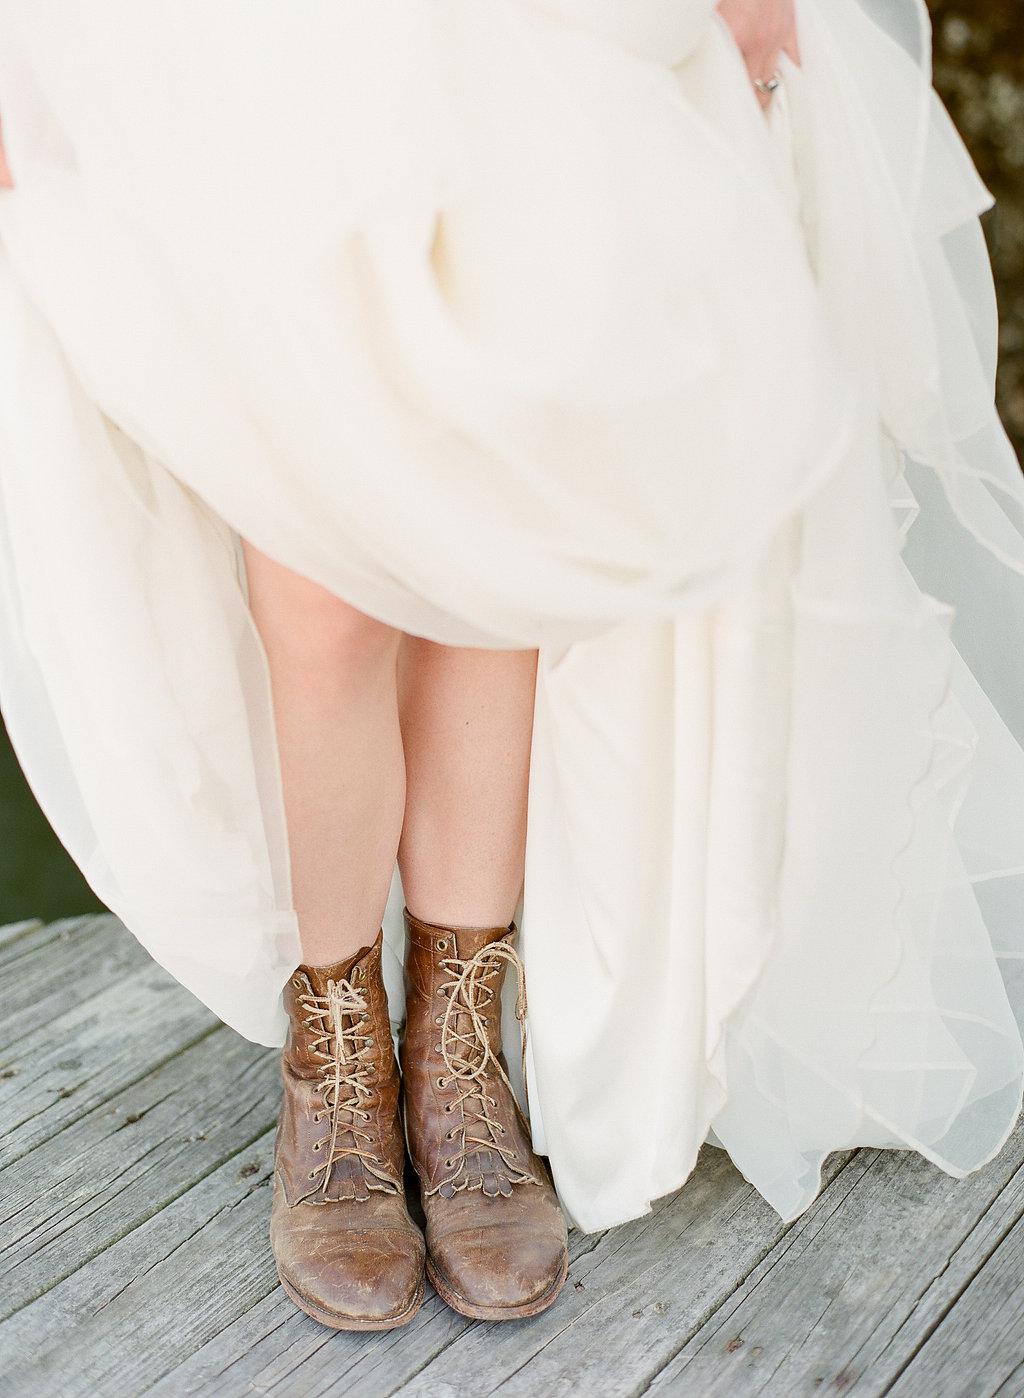 the-wyld-dock-bar-wedding-ivory-and-beau-savannah-wedding-planner-savannah-event-designer-savannah-wedding-florist-sarah-seven-worthington-savannah-georgia-bridal-shop.jpg